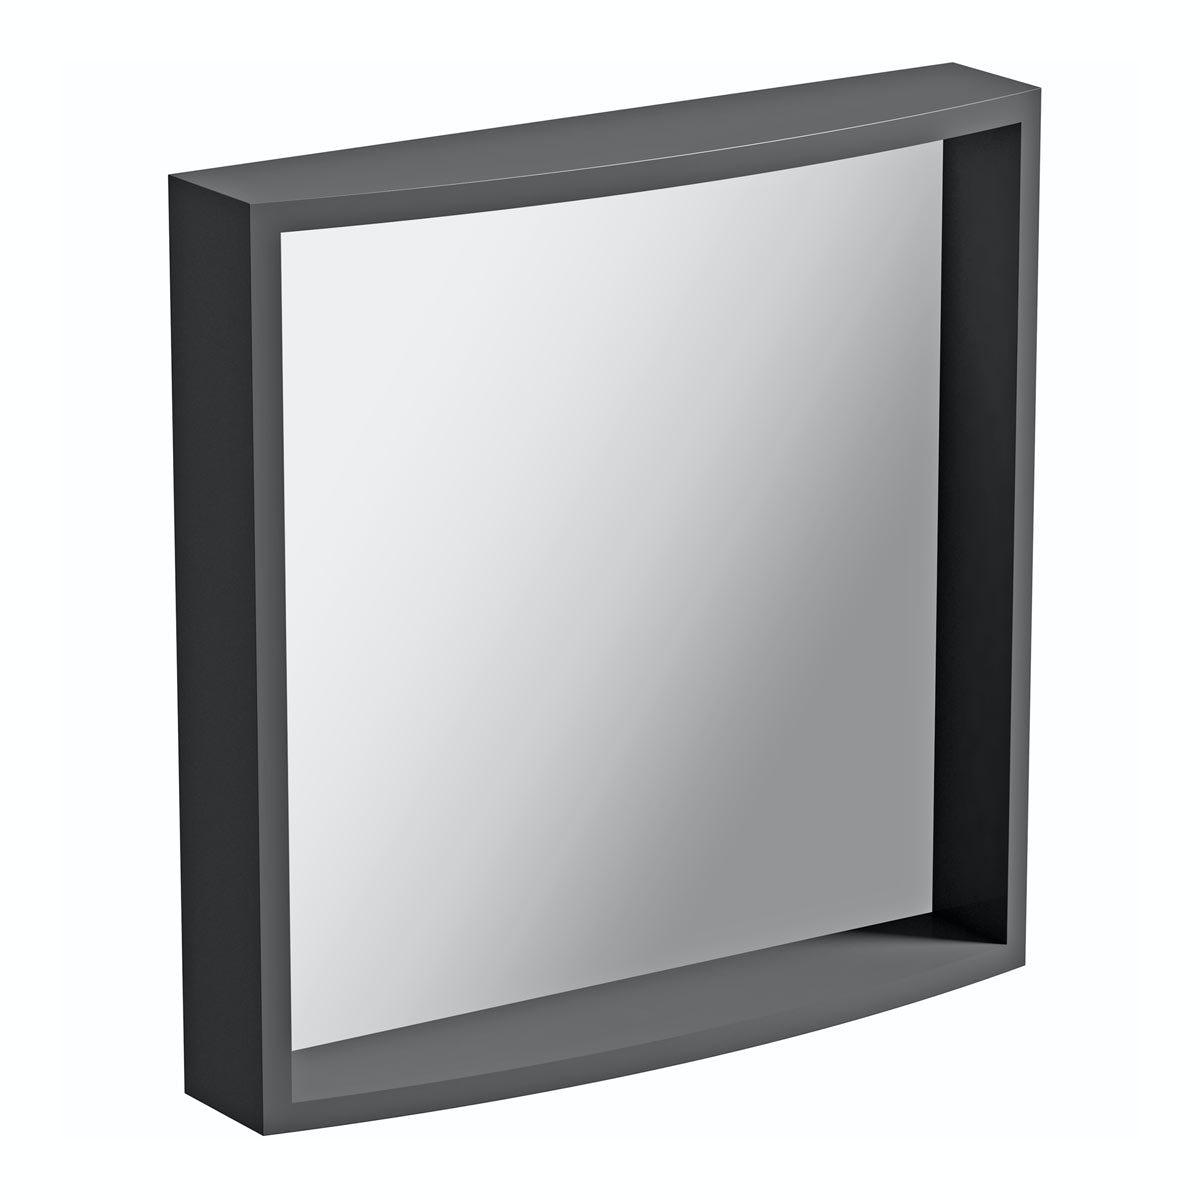 Mode Harrison slate bathroom mirror